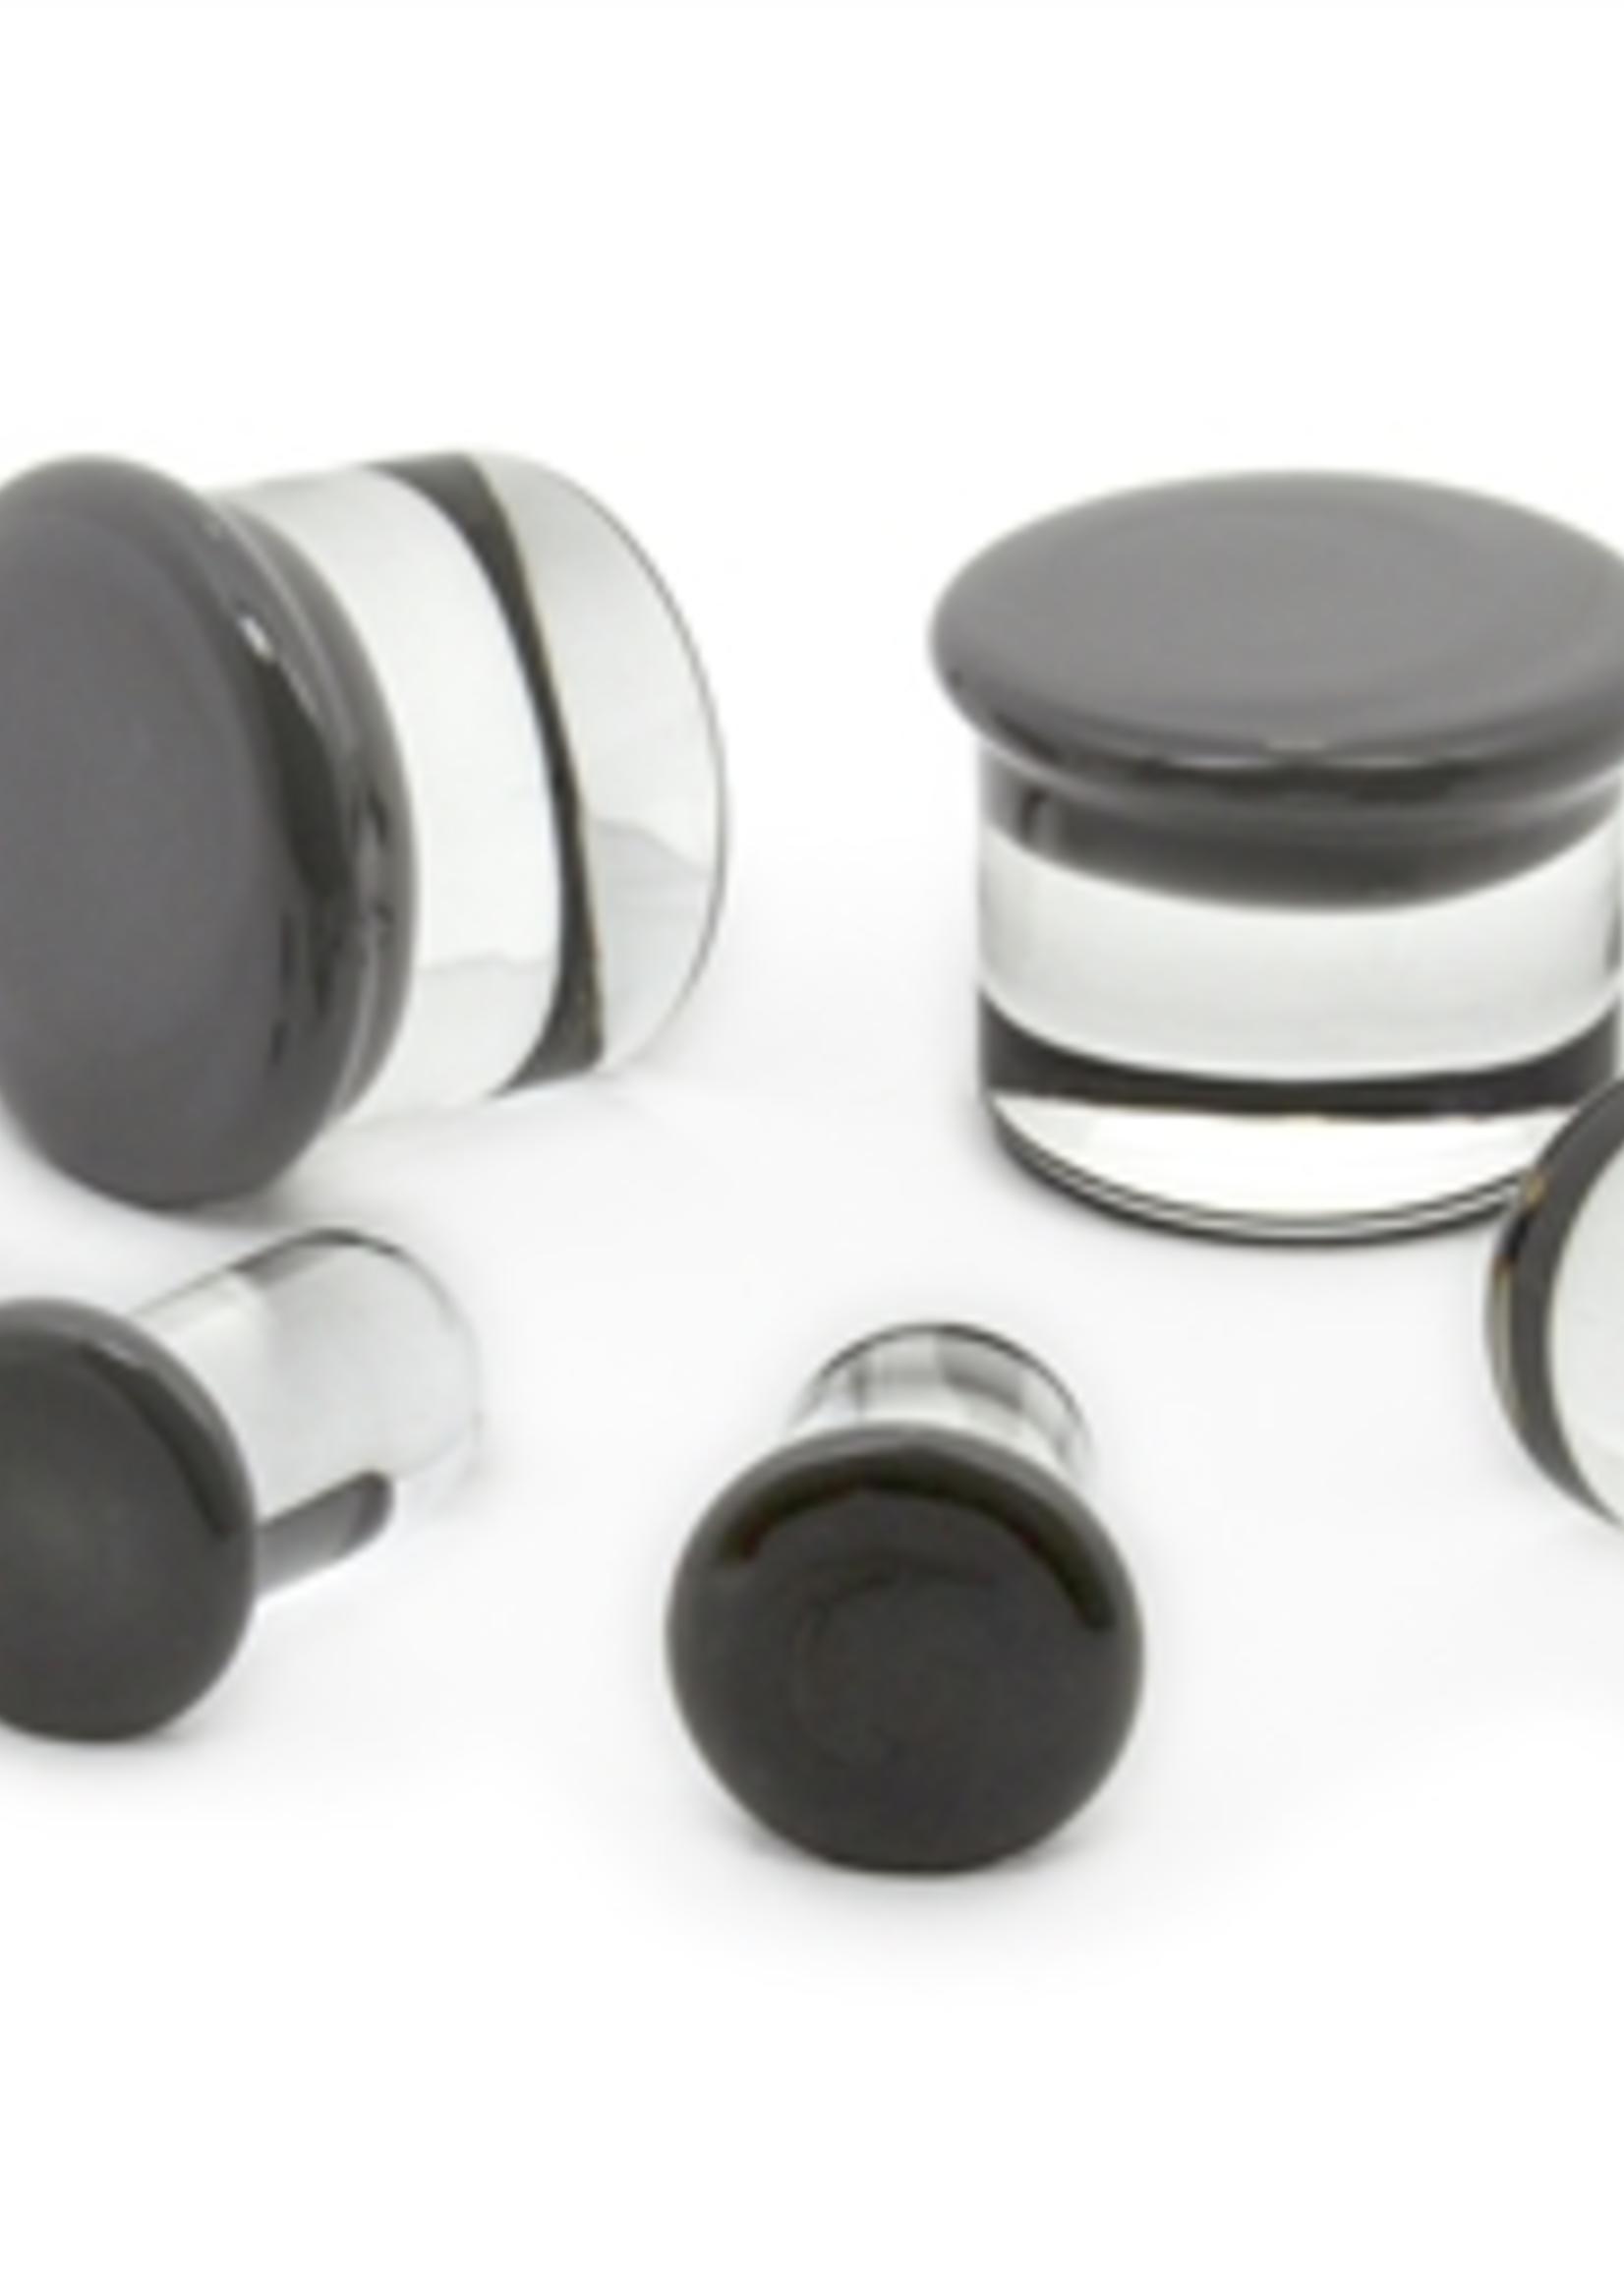 "7/8""- 22mm SF Glass Plugs"